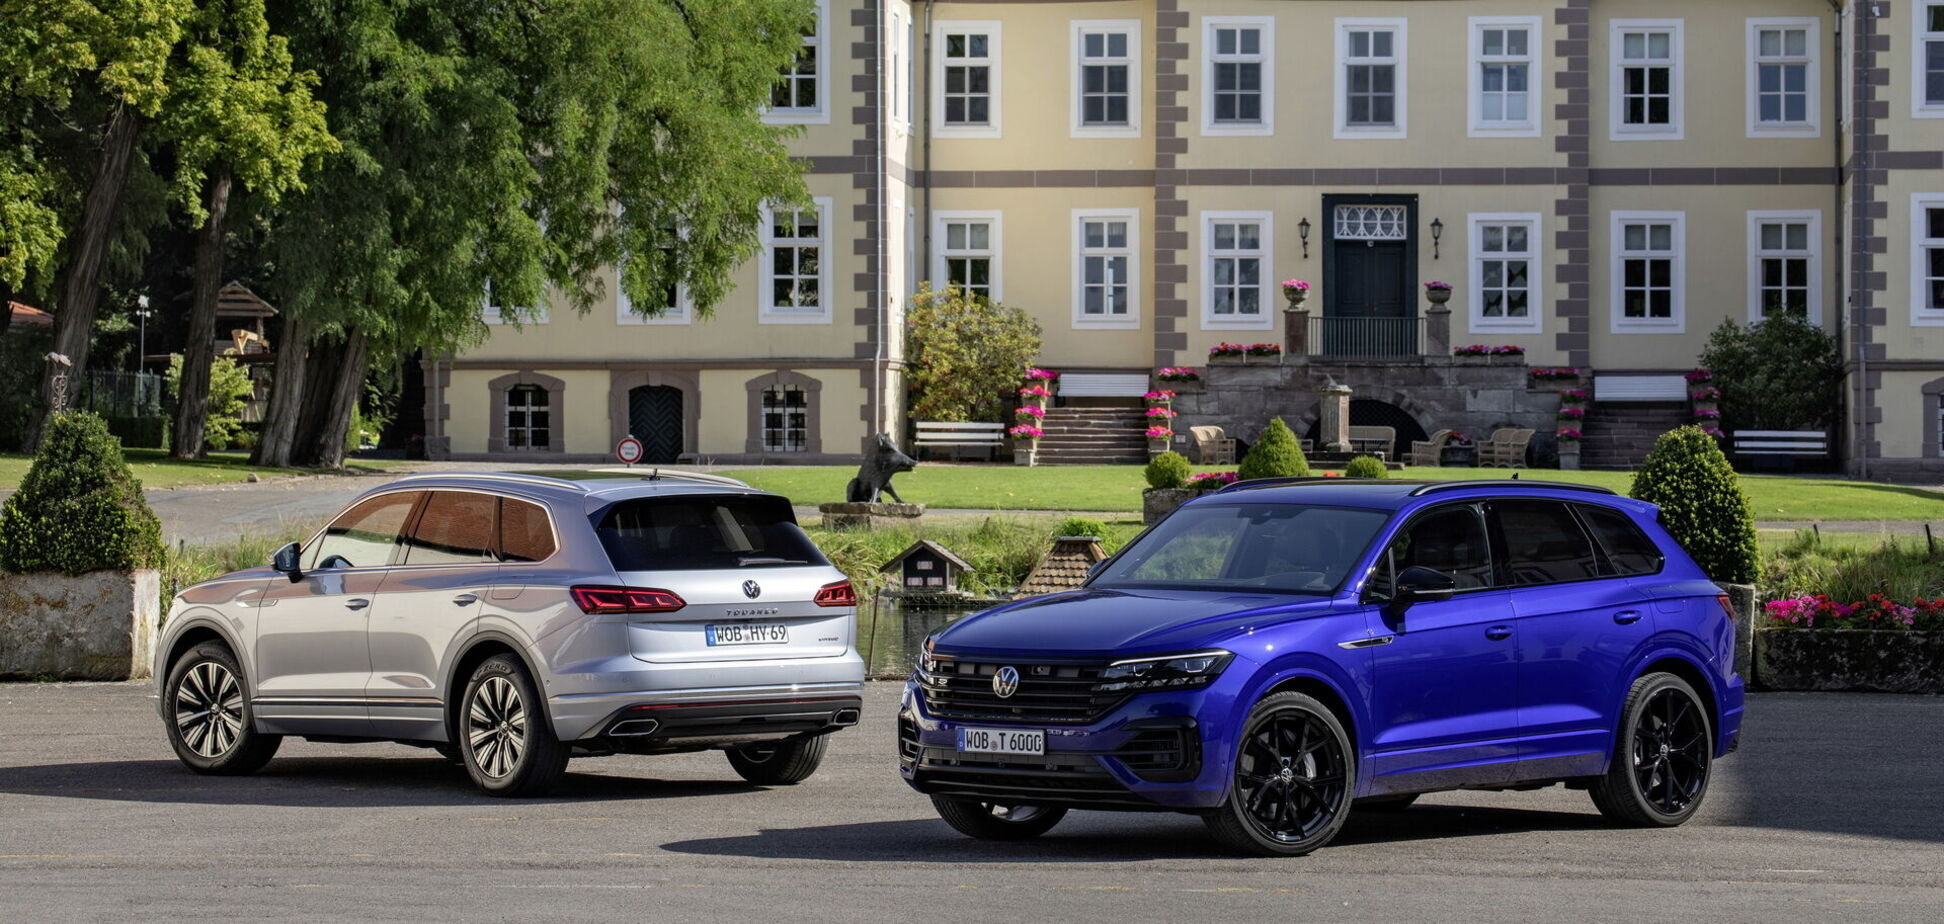 Volkswagen вывел на рынок Touareg с расходом 2,6 л на 100 км пробега